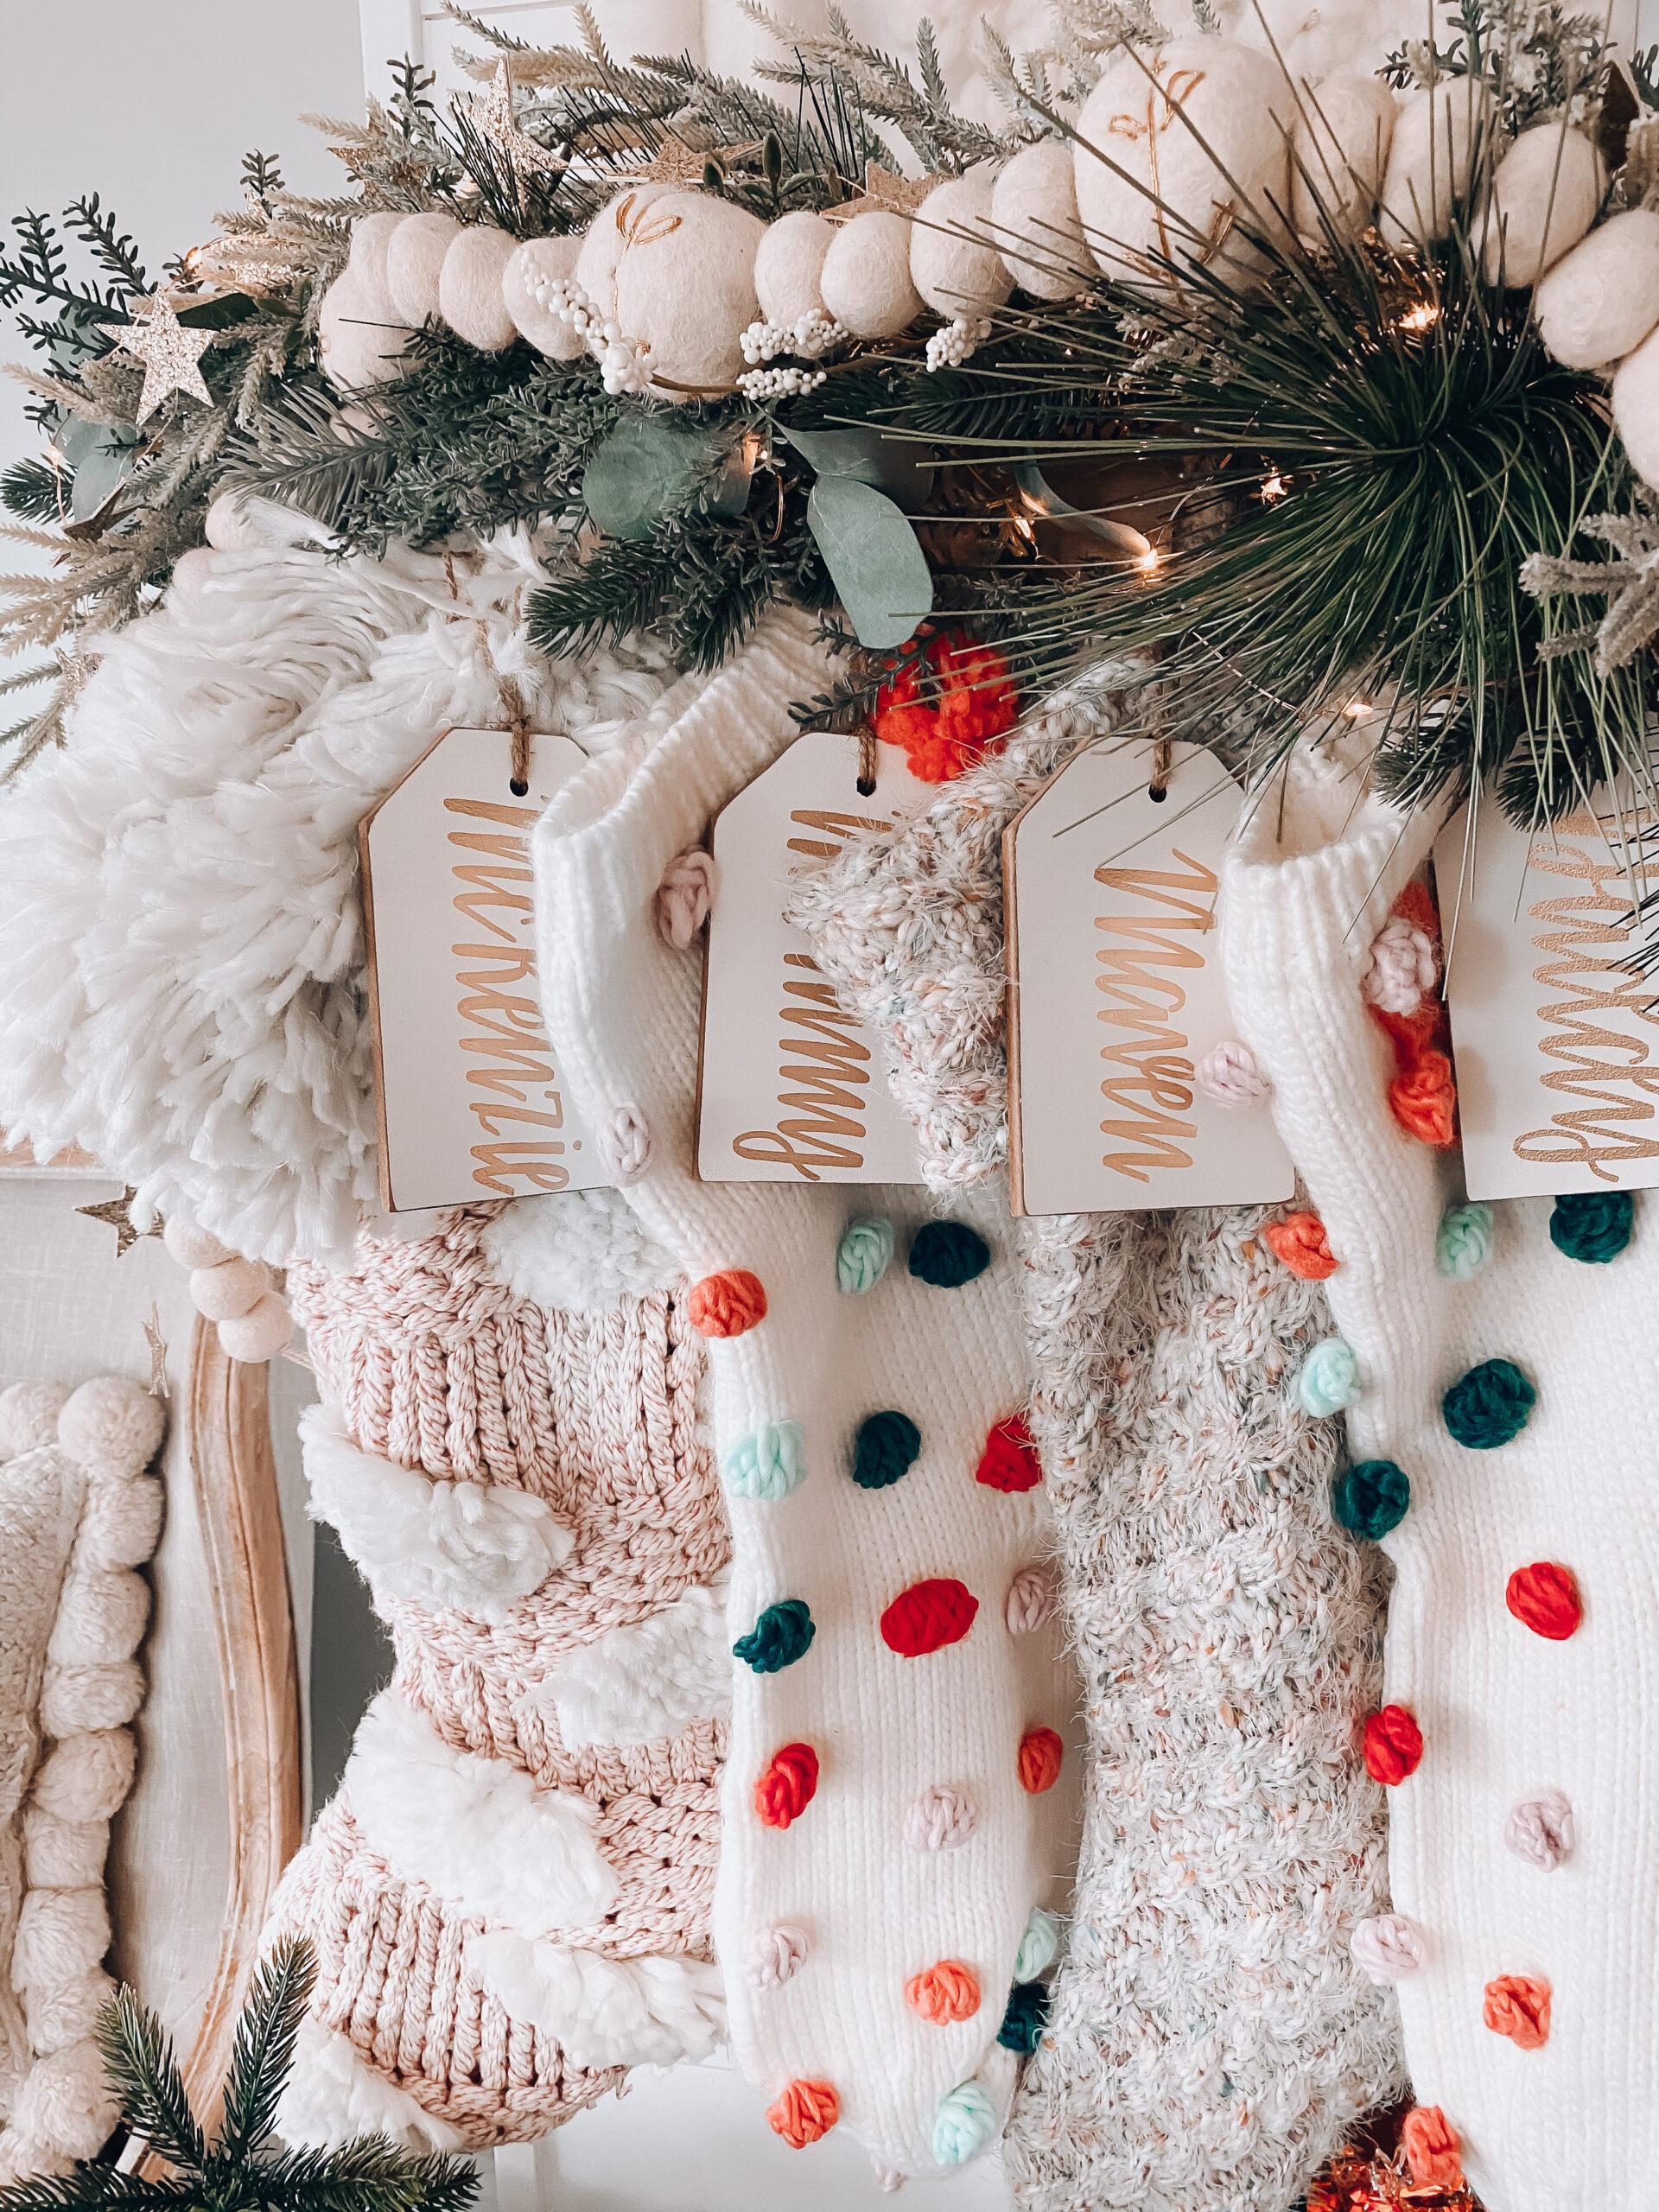 Boho Christmas mantel stockings for the family